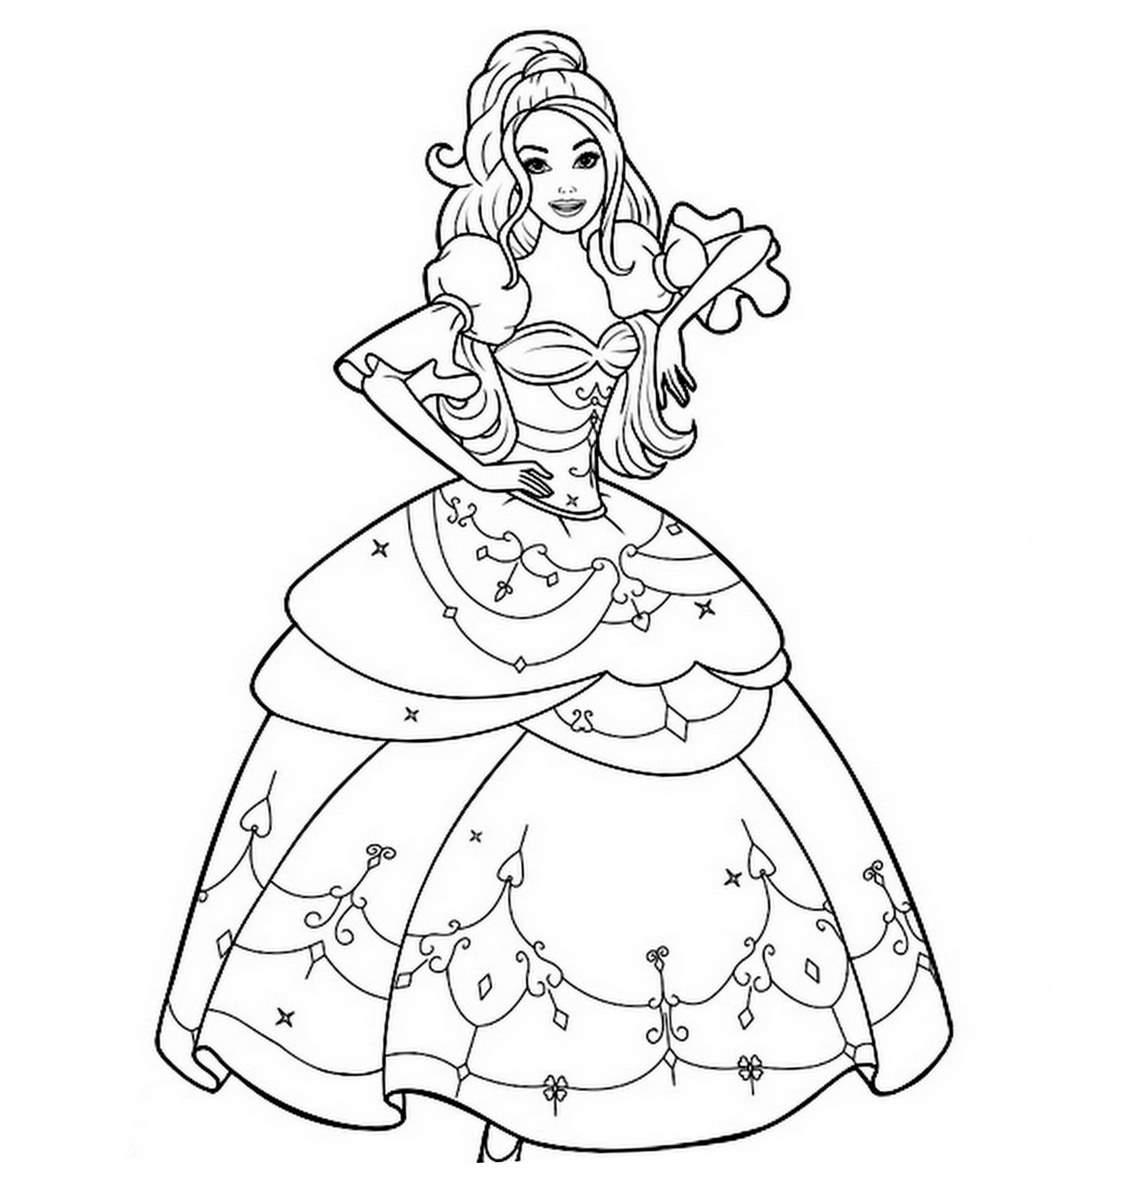 Dessin de princesse - Coloriage des princesses ...